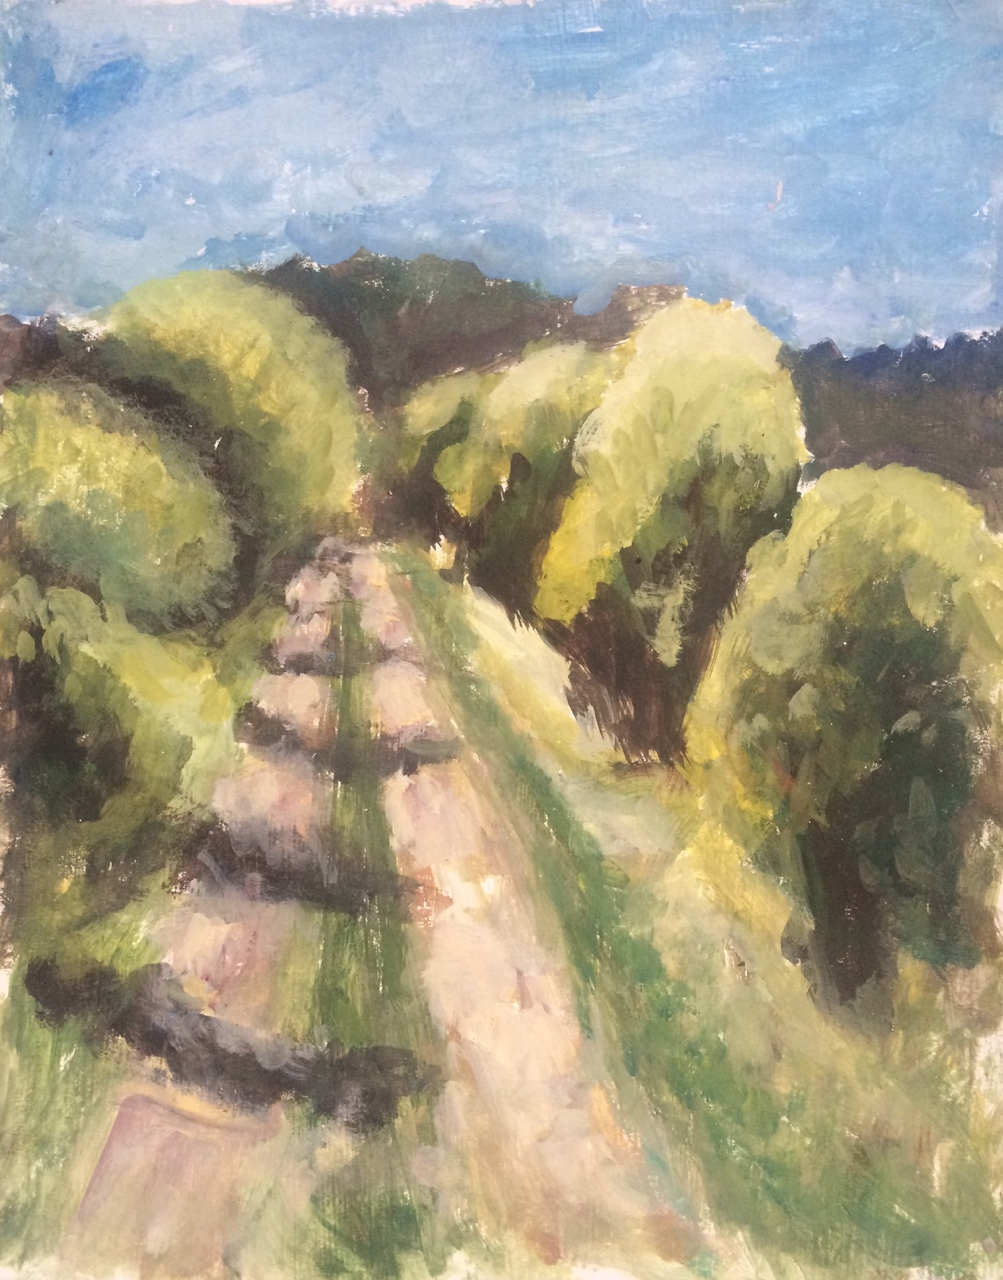 Landscape of Trees   2015. Oil on gessoed cardboard.